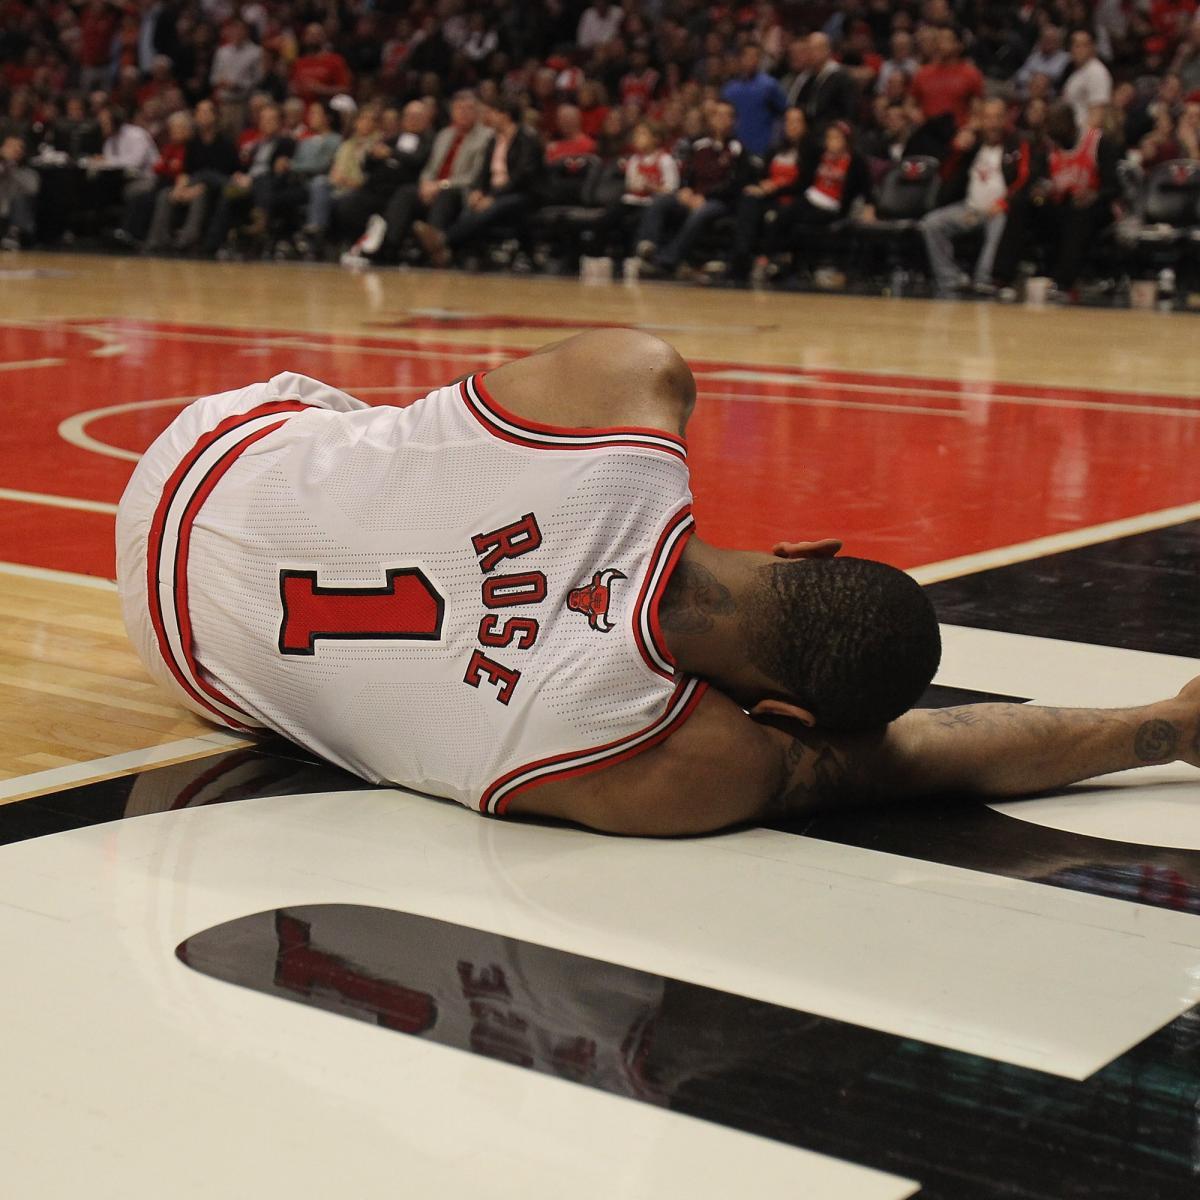 Nuggets Injury Report: NBA Playoffs 2012: Derrick Rose Injury Makes Celtics Team